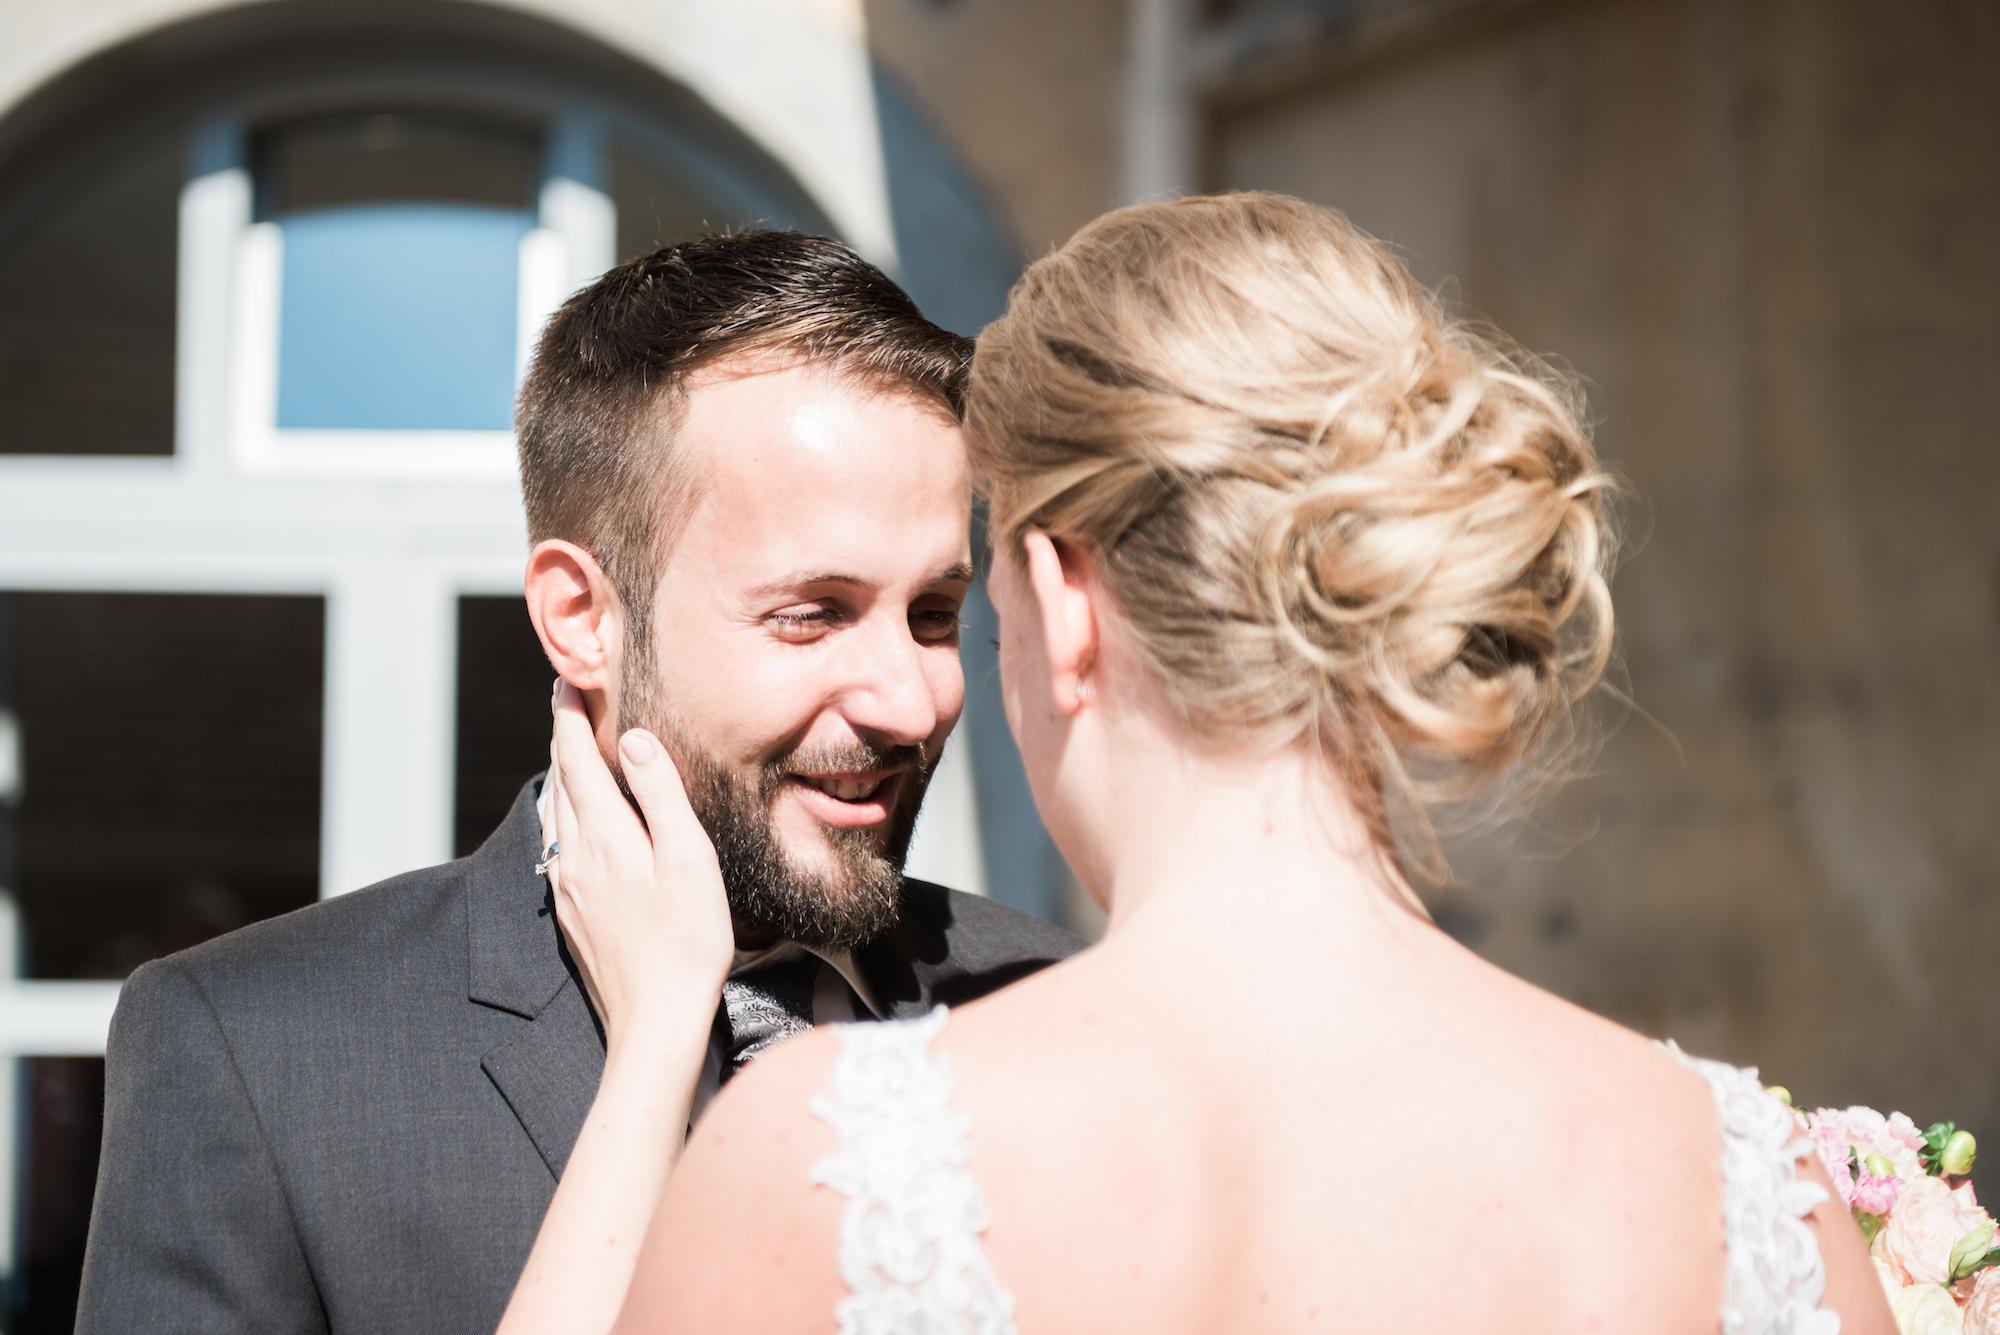 NadiaundMichael_Hochzeit_BekaBitterliFotografie_195.jpg